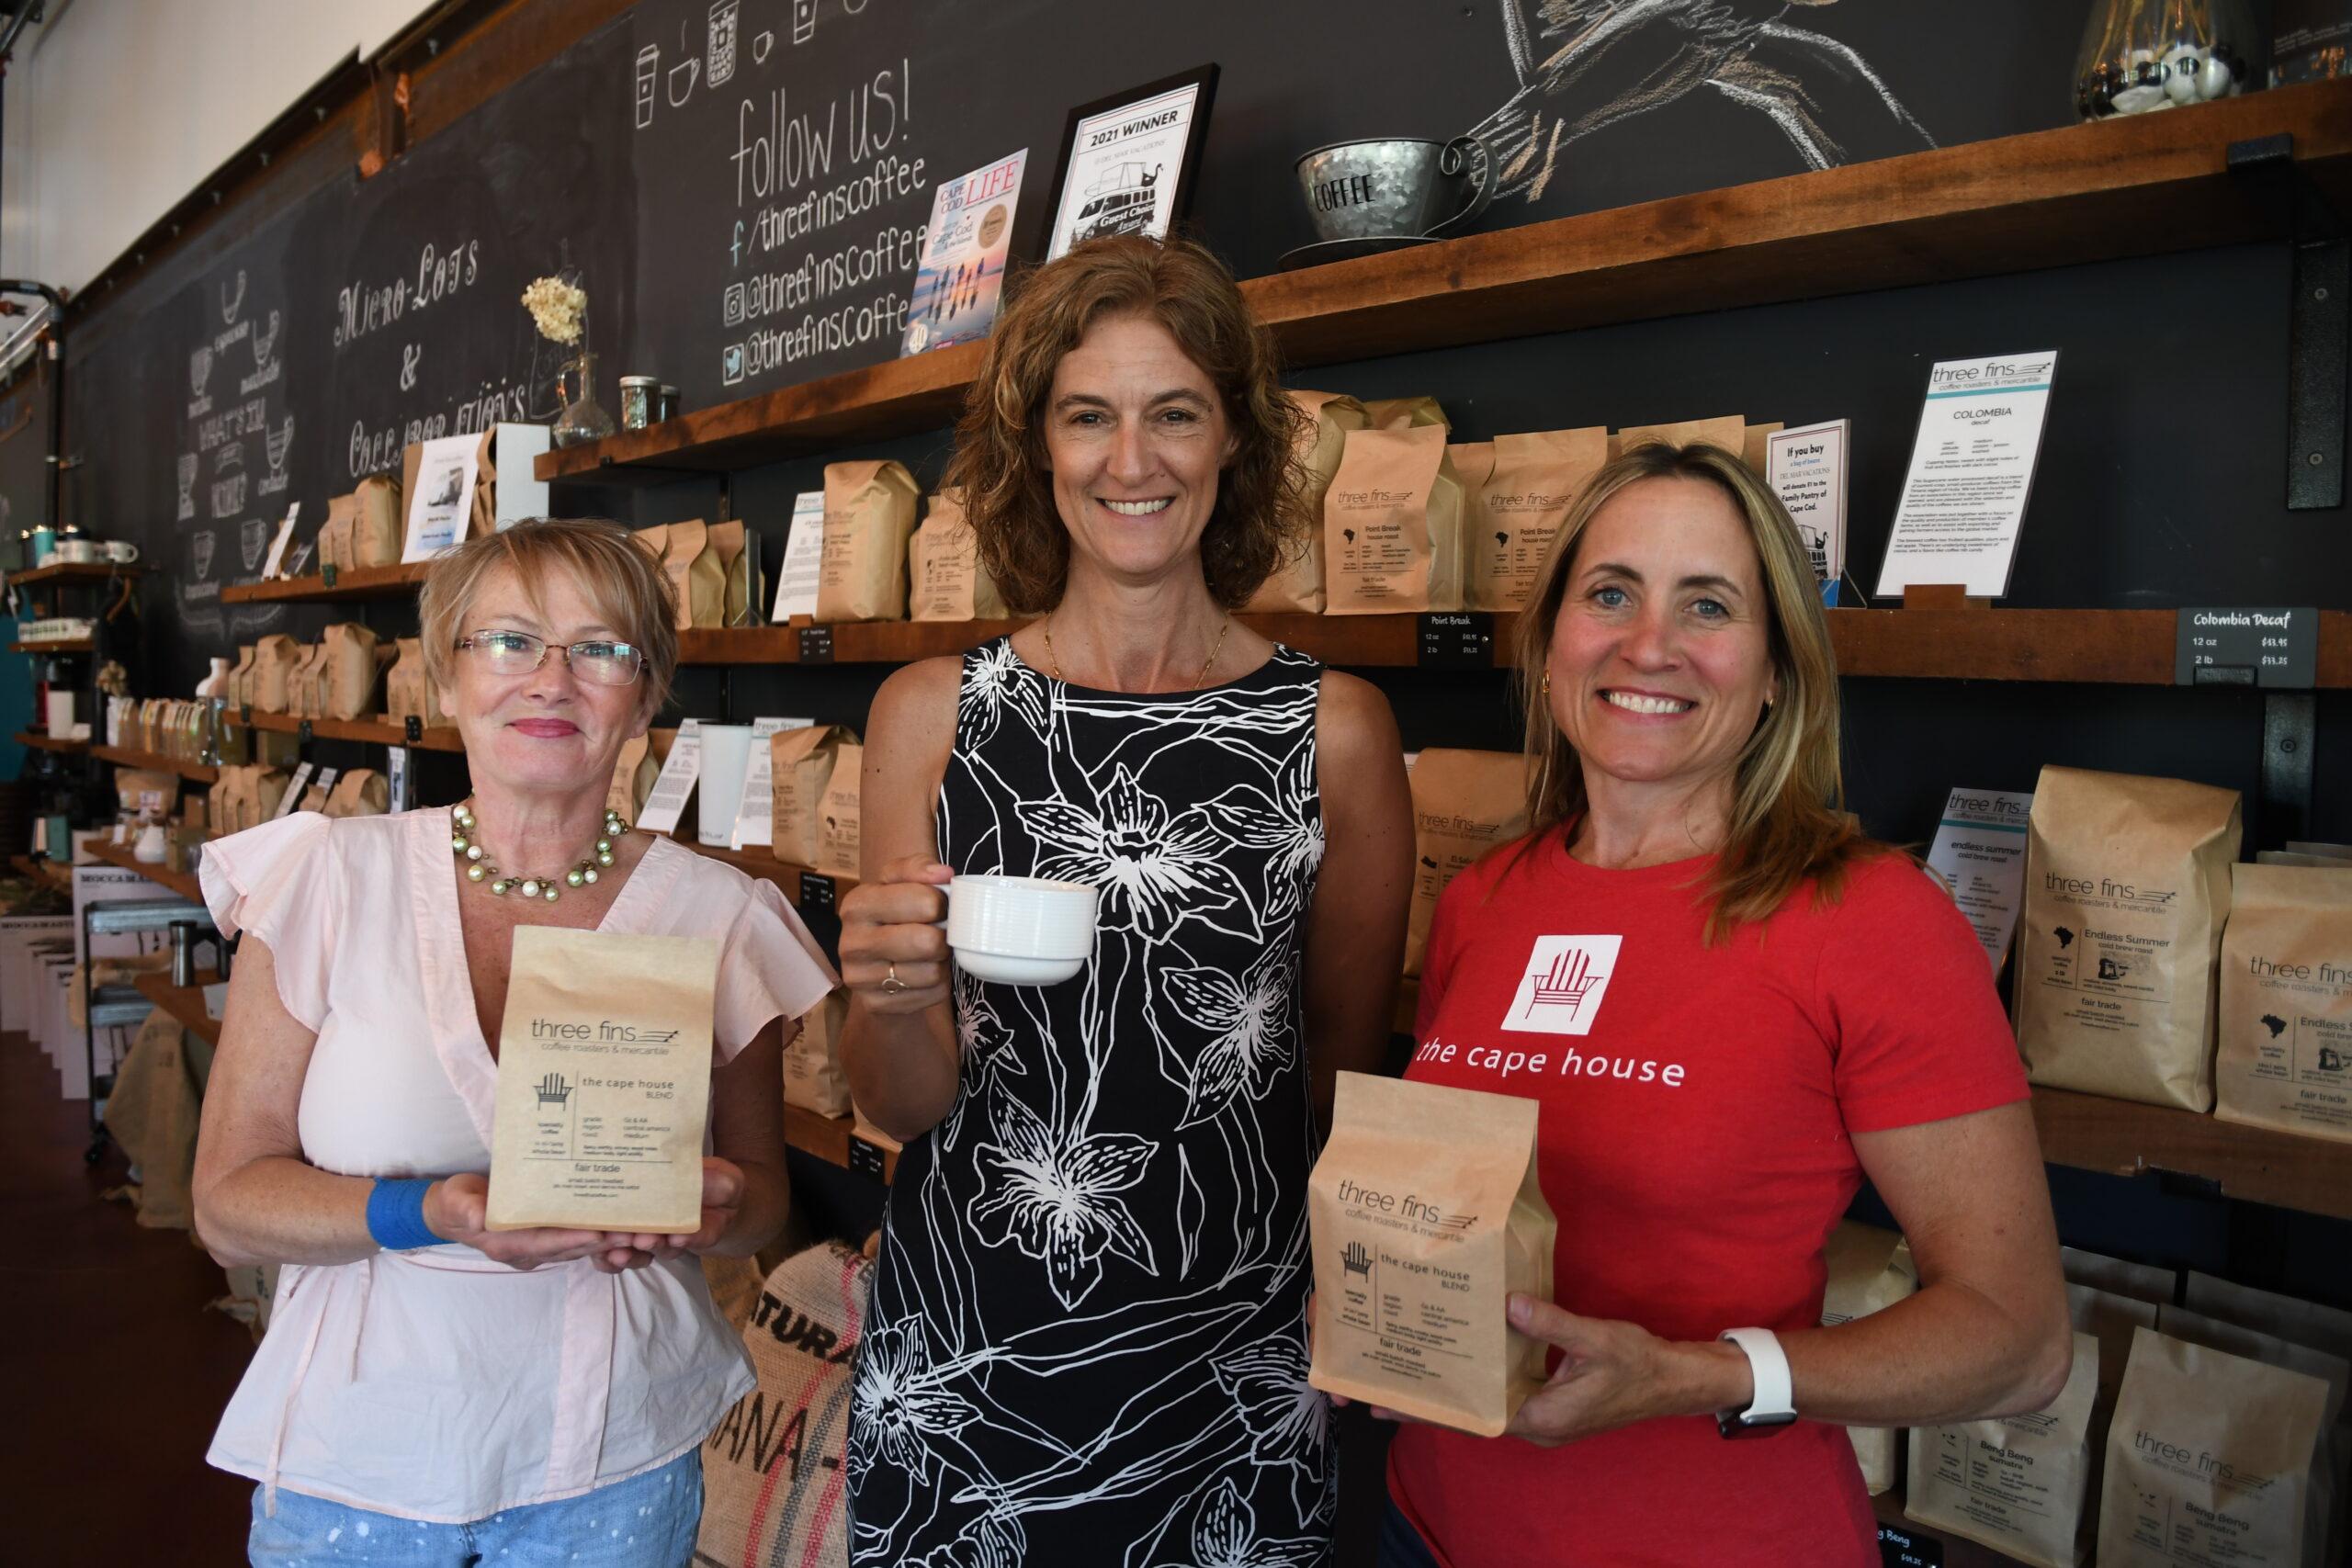 Catherine Bieri, Alisa Magnotta, and Katie Clancy at Three Fins Coffee in Dennis